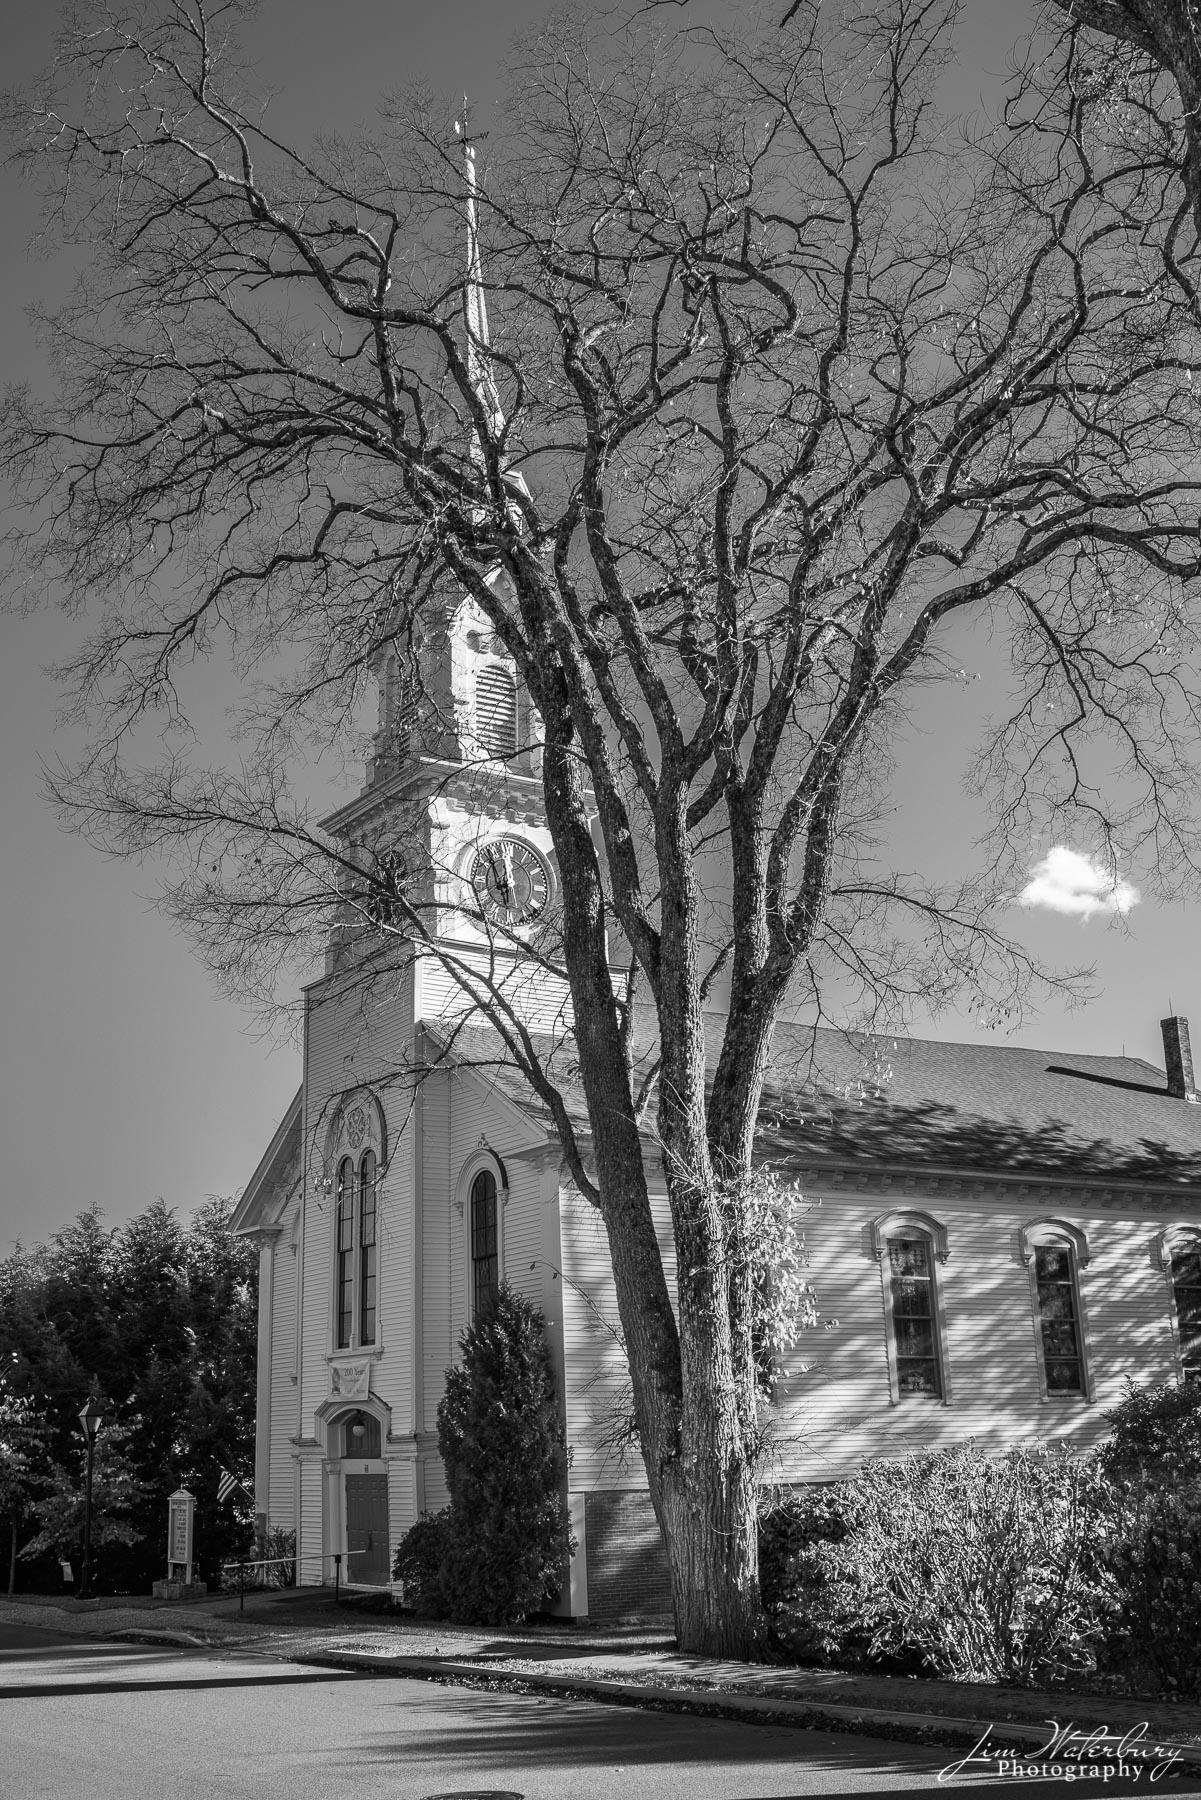 Trinitarian Congregational Parish of Castine, in black and white.